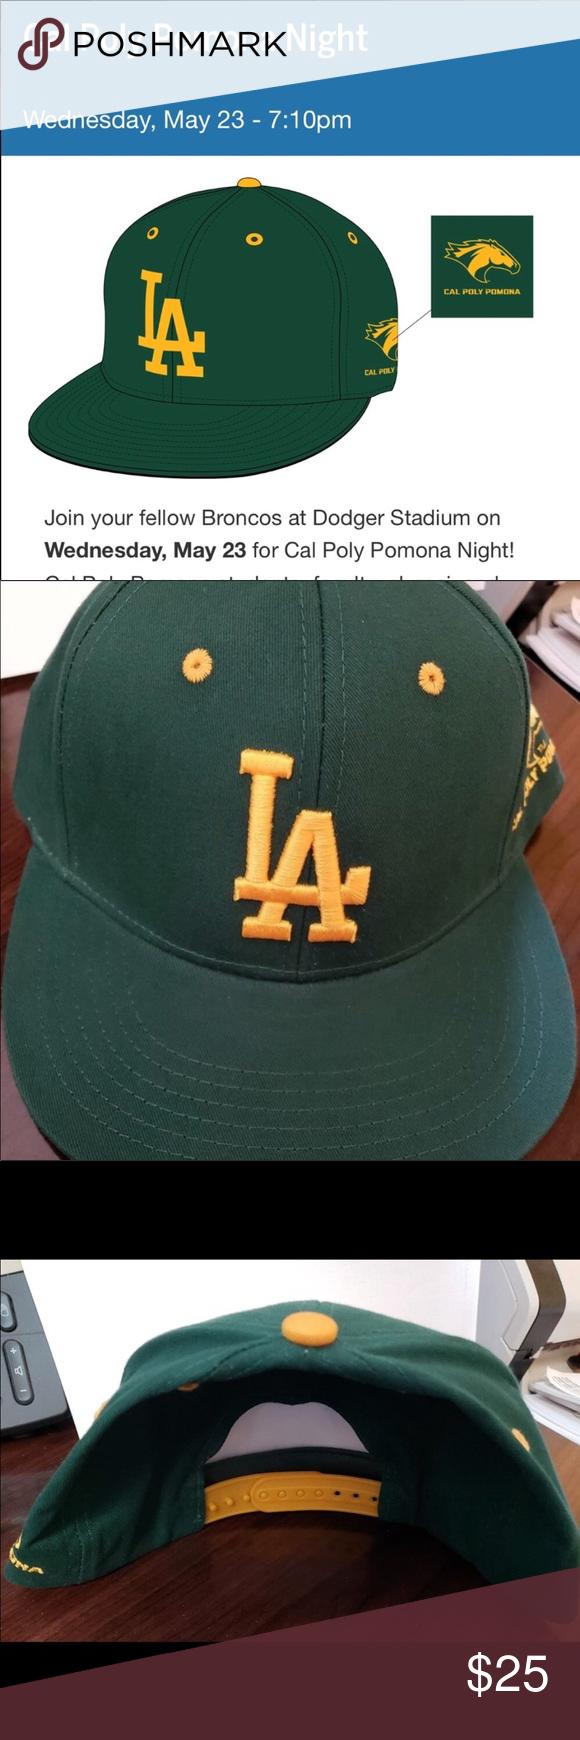 7f29755e88ea50 Cal Poly Pomona Dodger hat Cal Poly Pomona Night at Dodger stadium  Accessories Hats